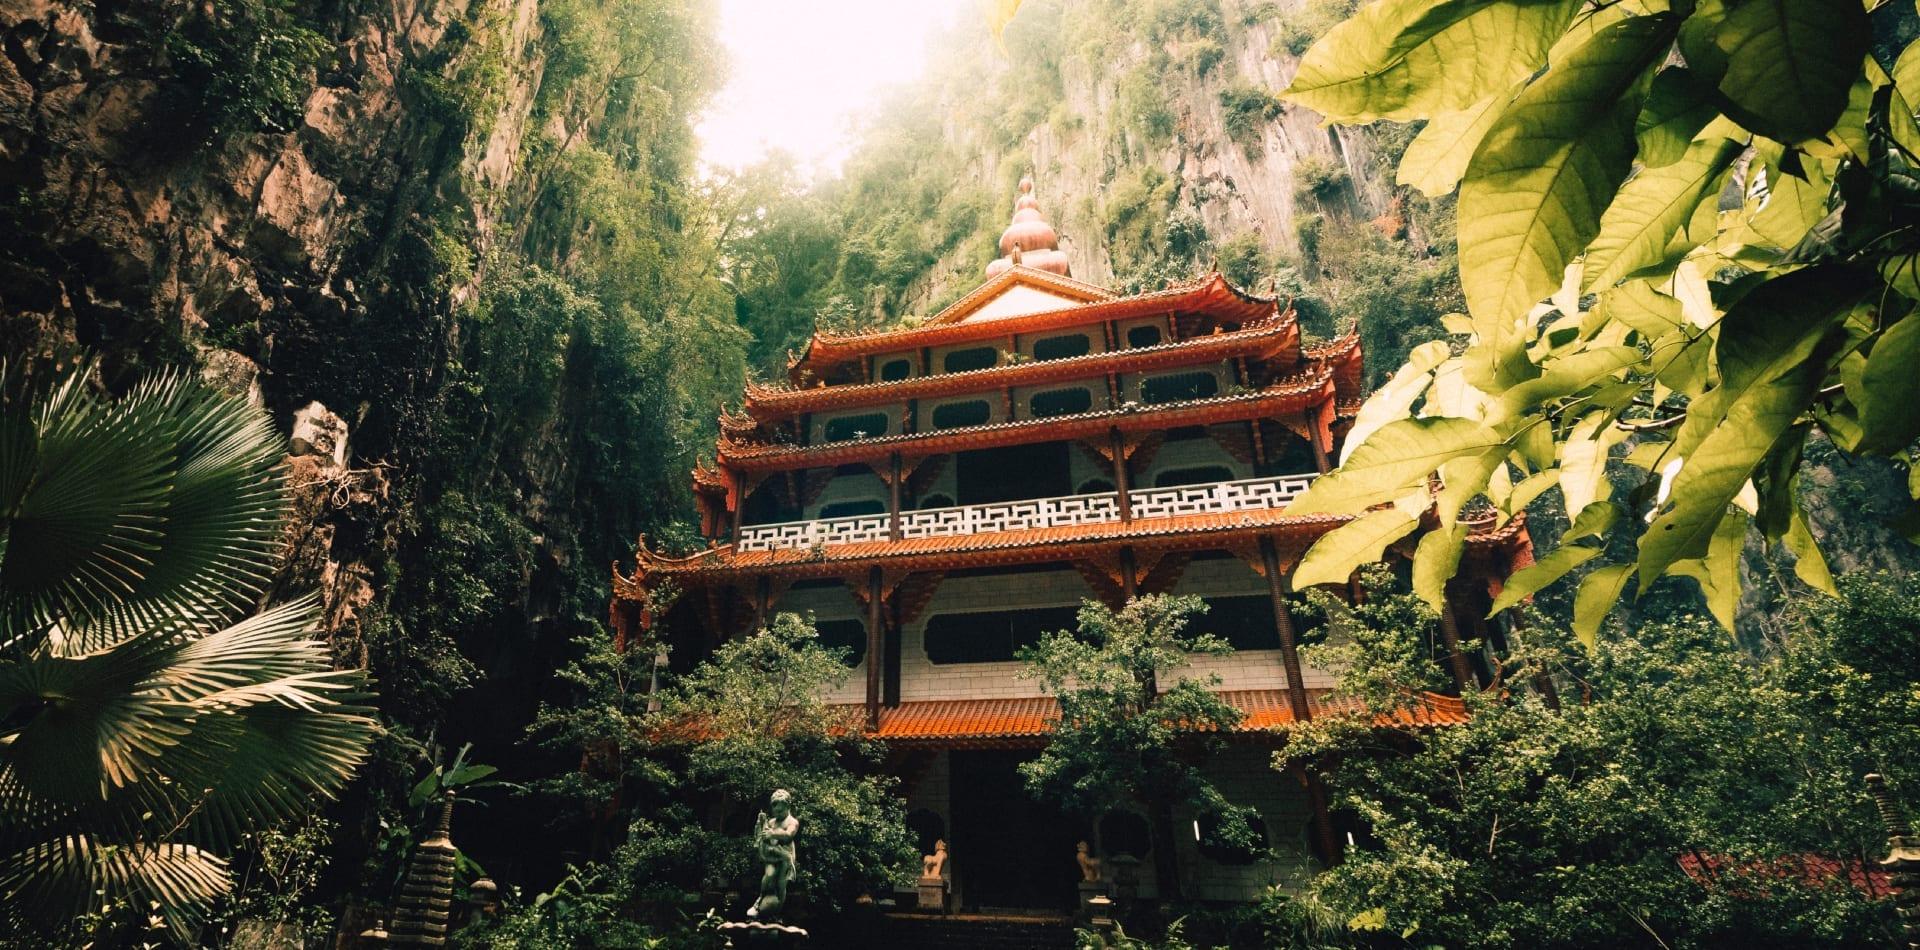 Jungle temple in Malaysia